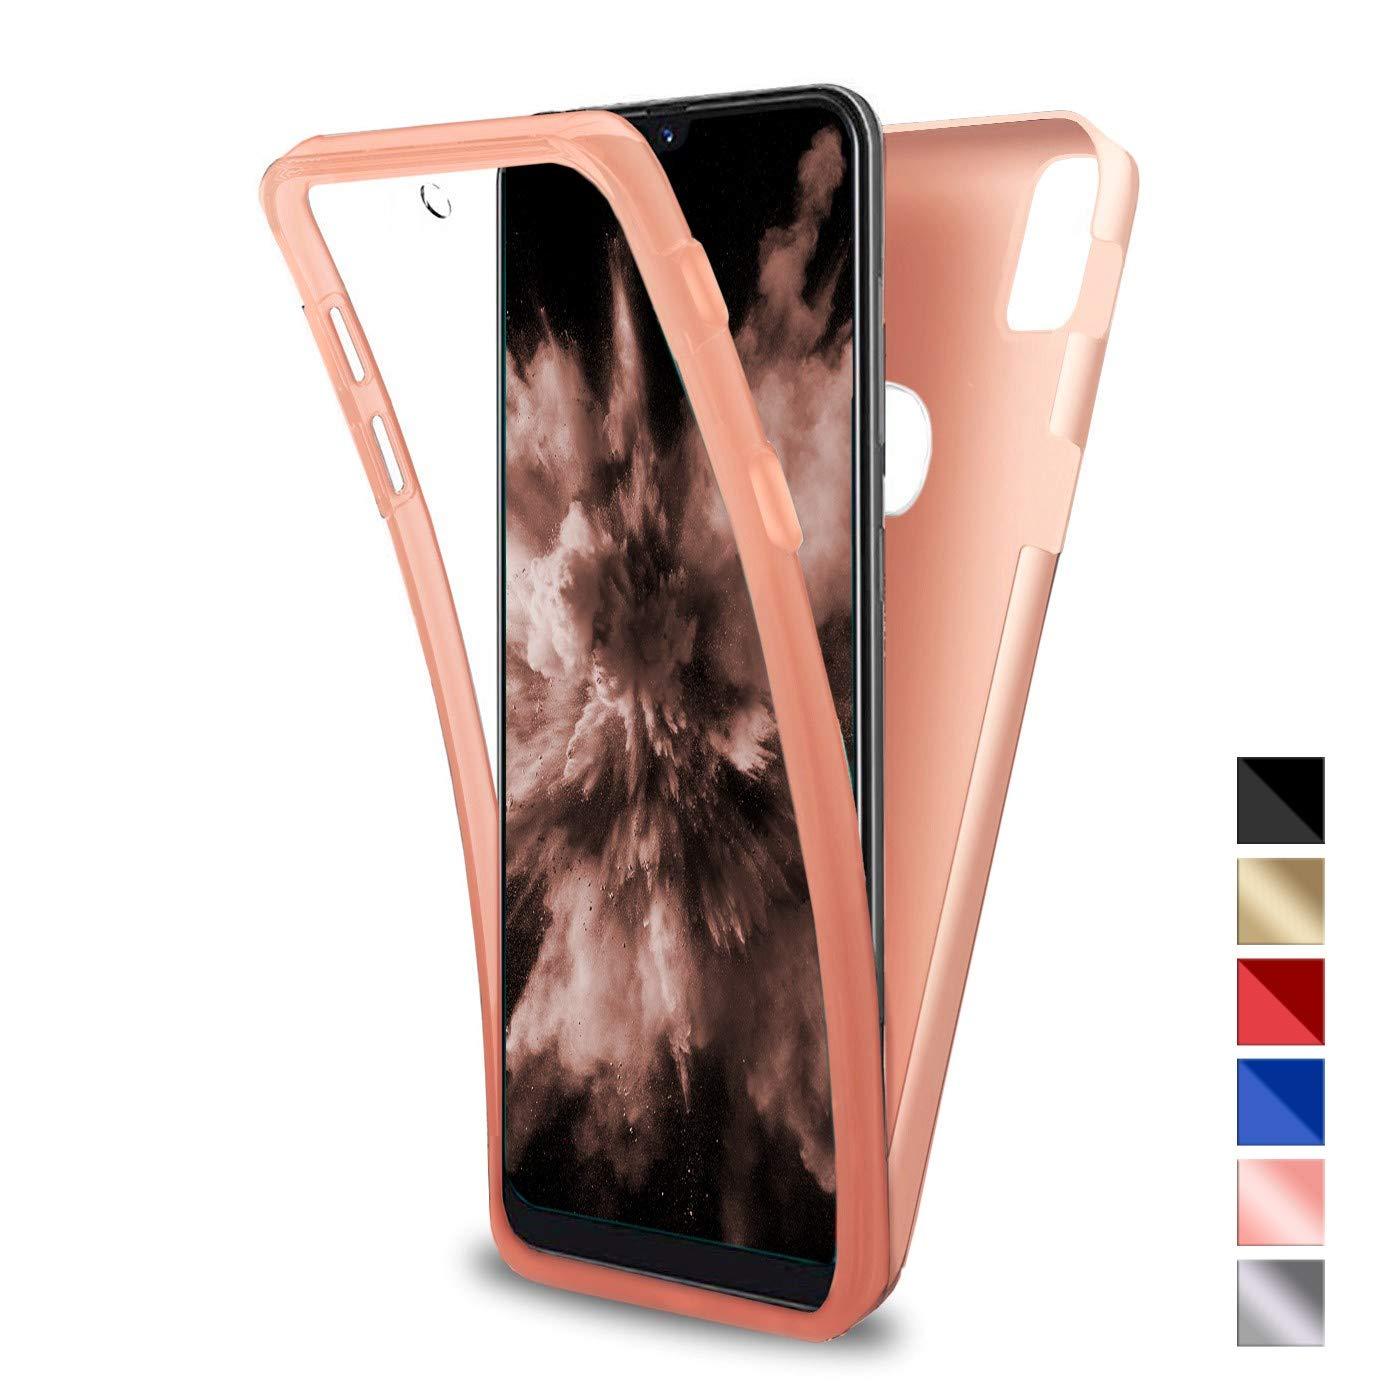 Ultra Slim Doble Cara Carcasa Protector TPU Silicona Oro PC Dura Resistente Anti-Ara/ñazos Protectora Case Cover para Huawei Y6 2019 Funda para Huawei Y6 2019